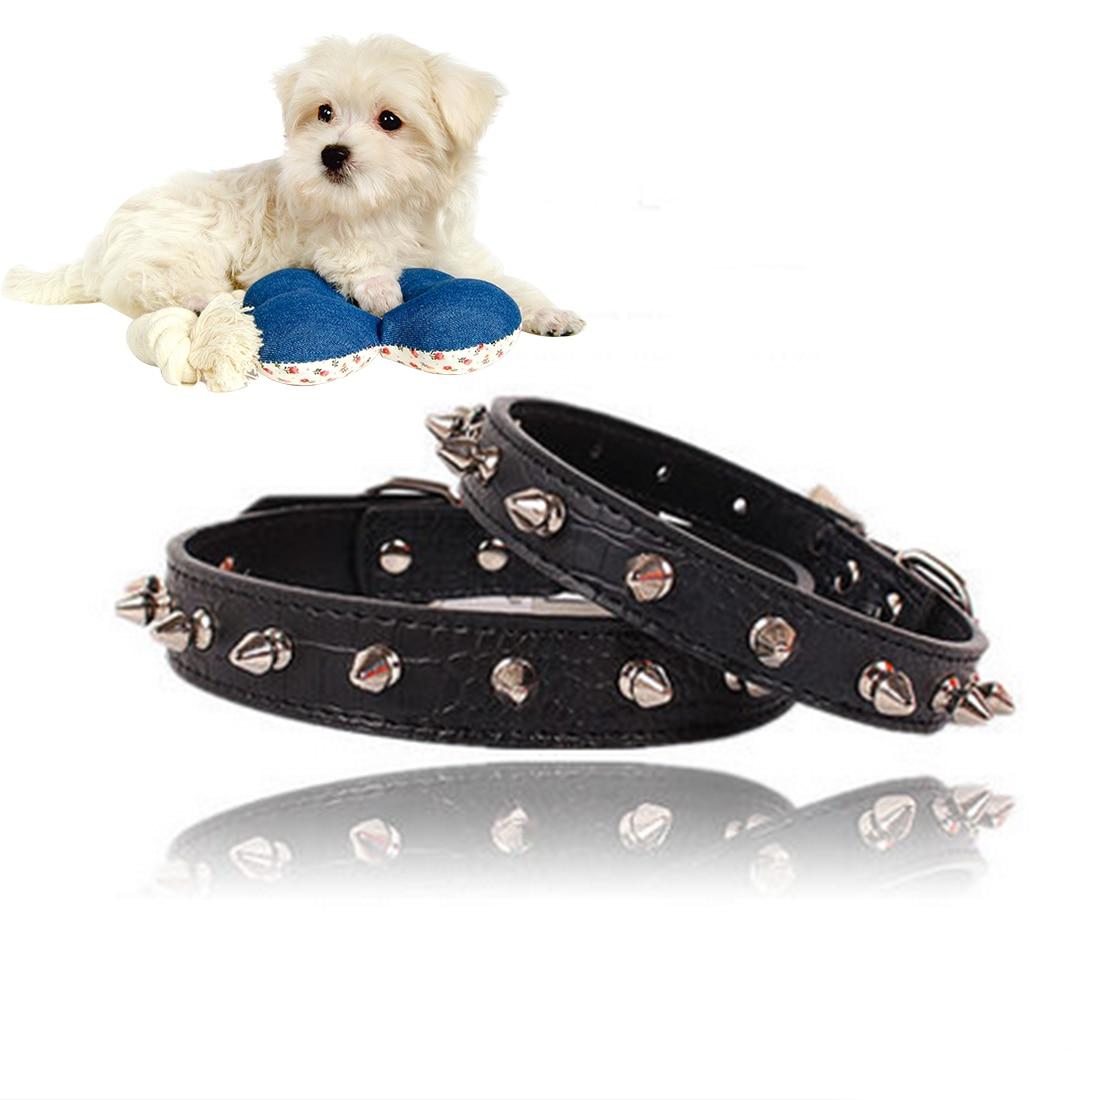 Hot sale Pet Puppy Dog Collars Adjustable PU Leather Punk Rivet Spiked Studded Pet Collar Neck Straps